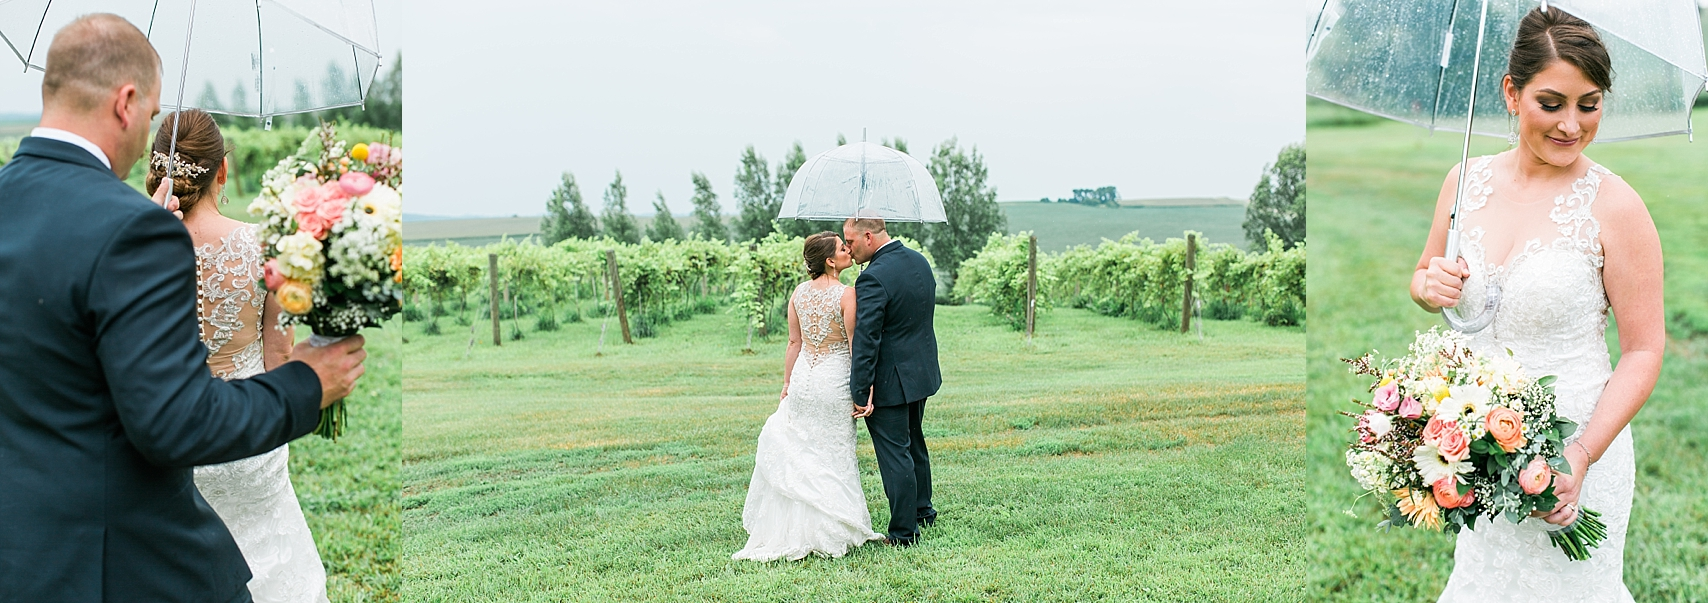 Minnesota Minneapolis Wedding Photographer Best Of 2018 Weddings Mallory Kiesow Photography_0006.jpg